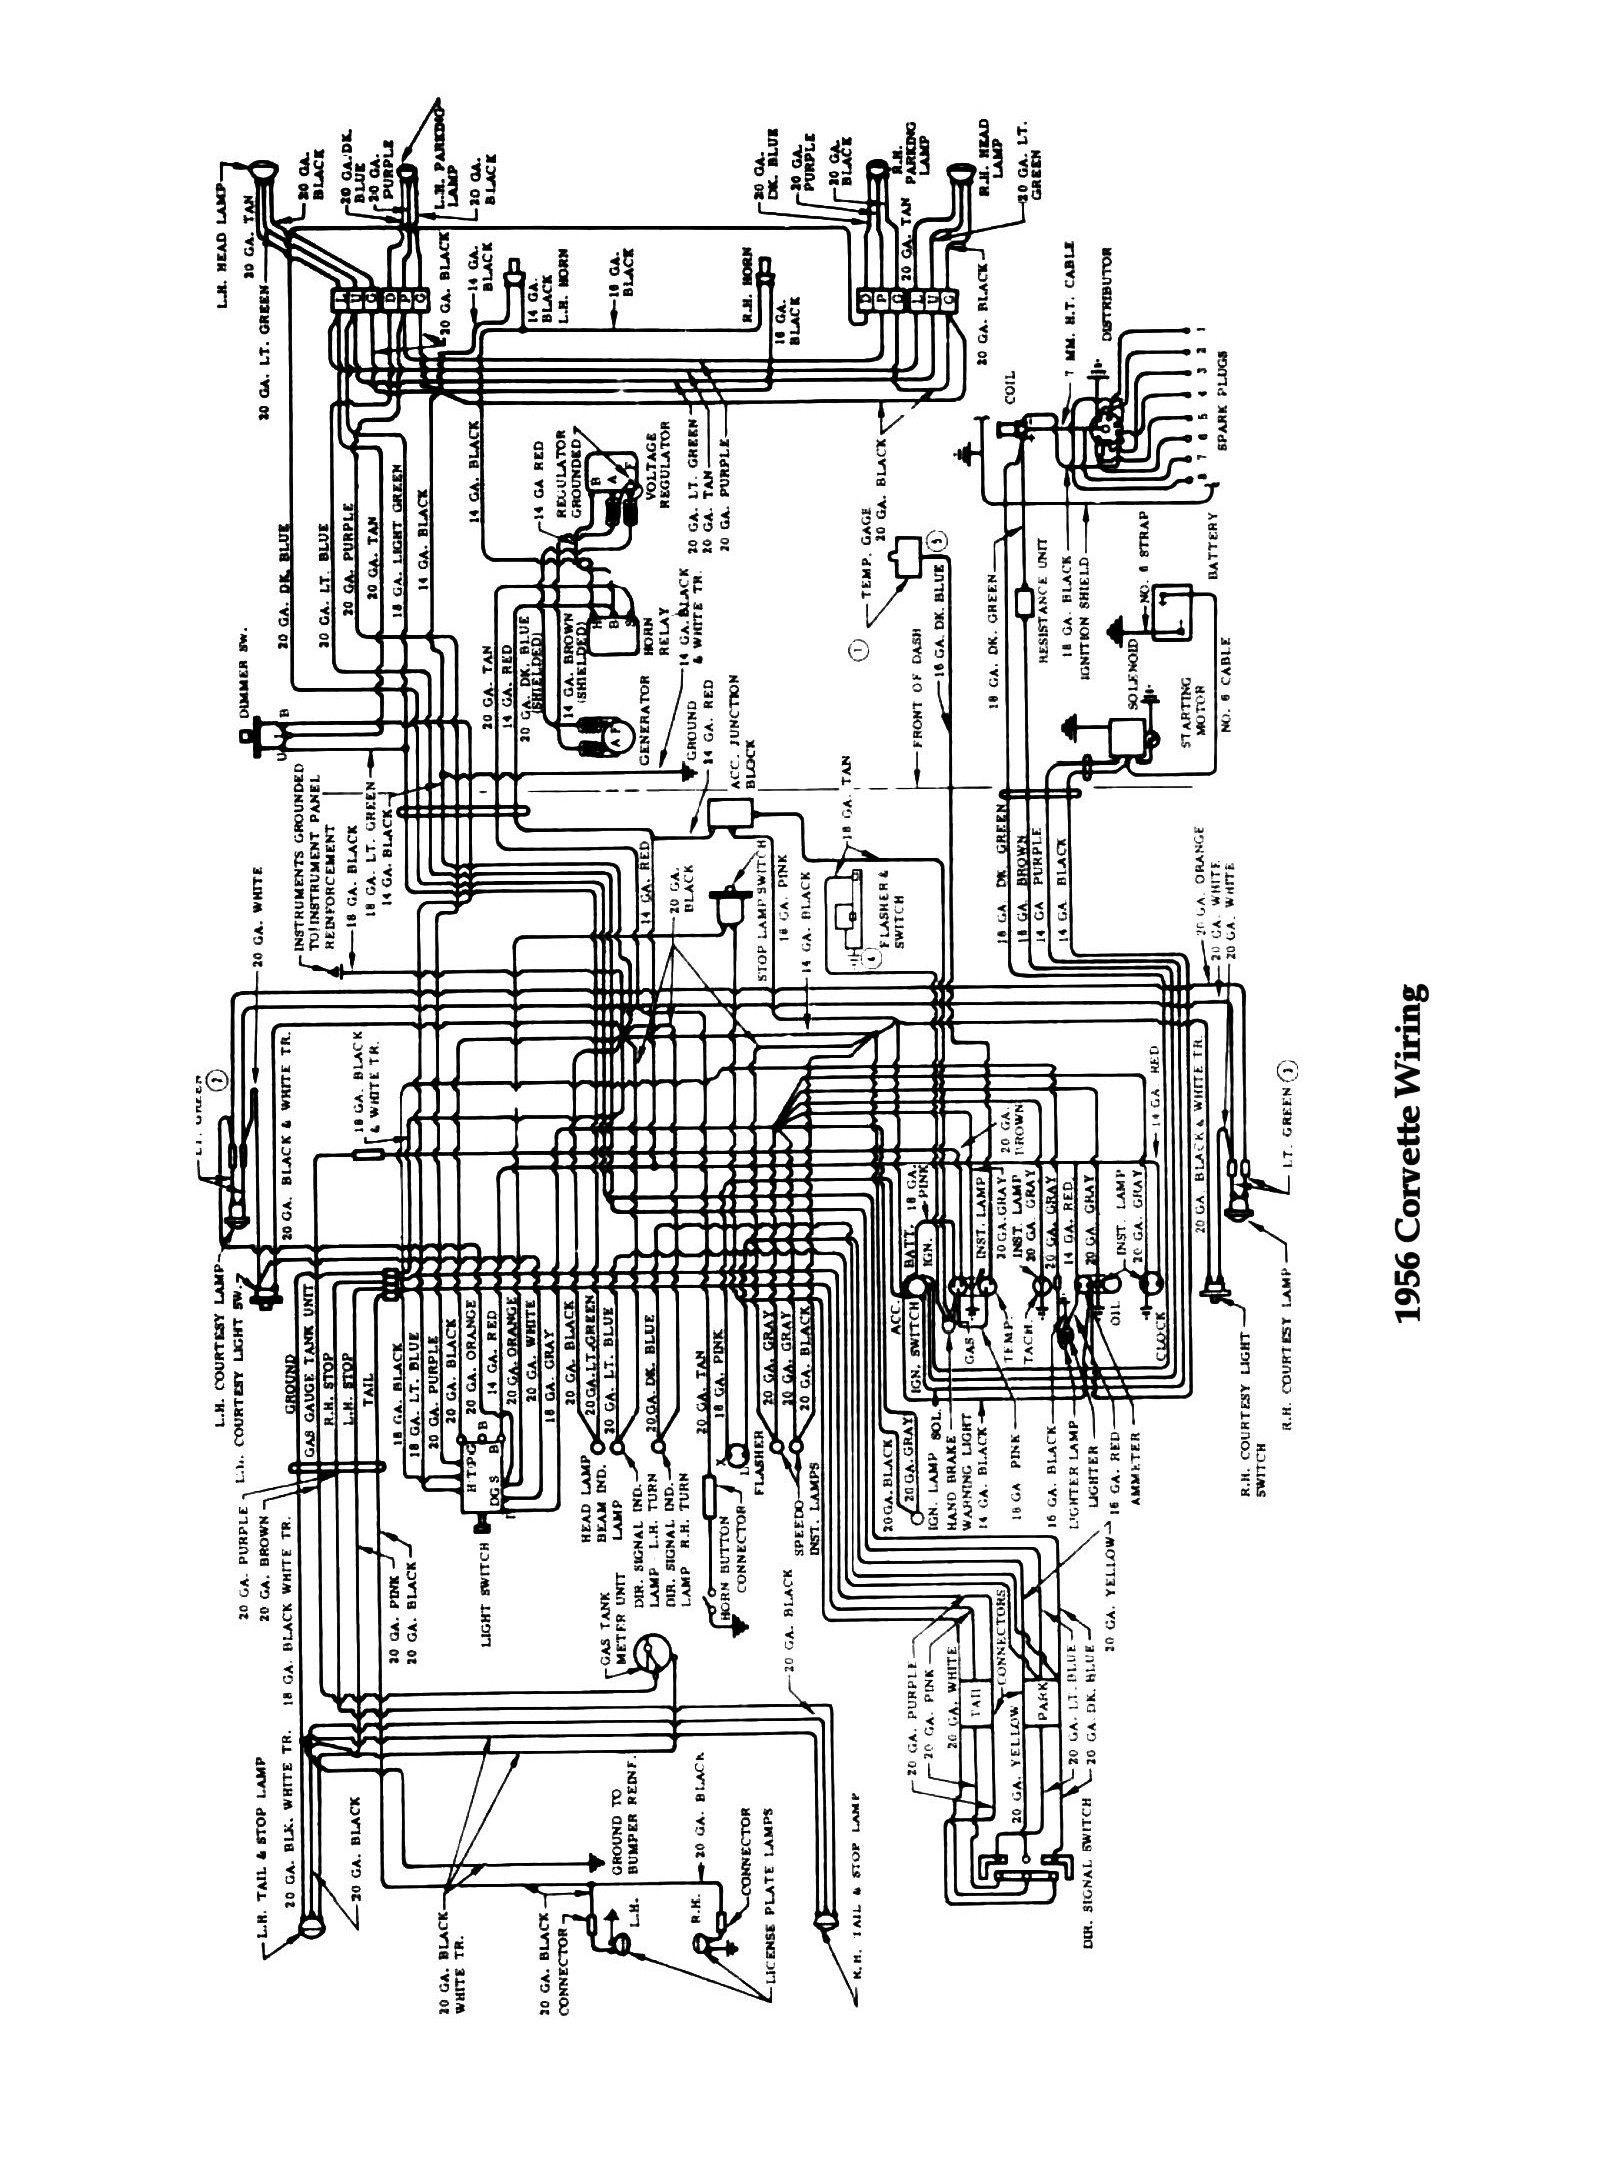 1979 corvette dash wiring diagram plumbing a toilet drain chevy diagrams 1957